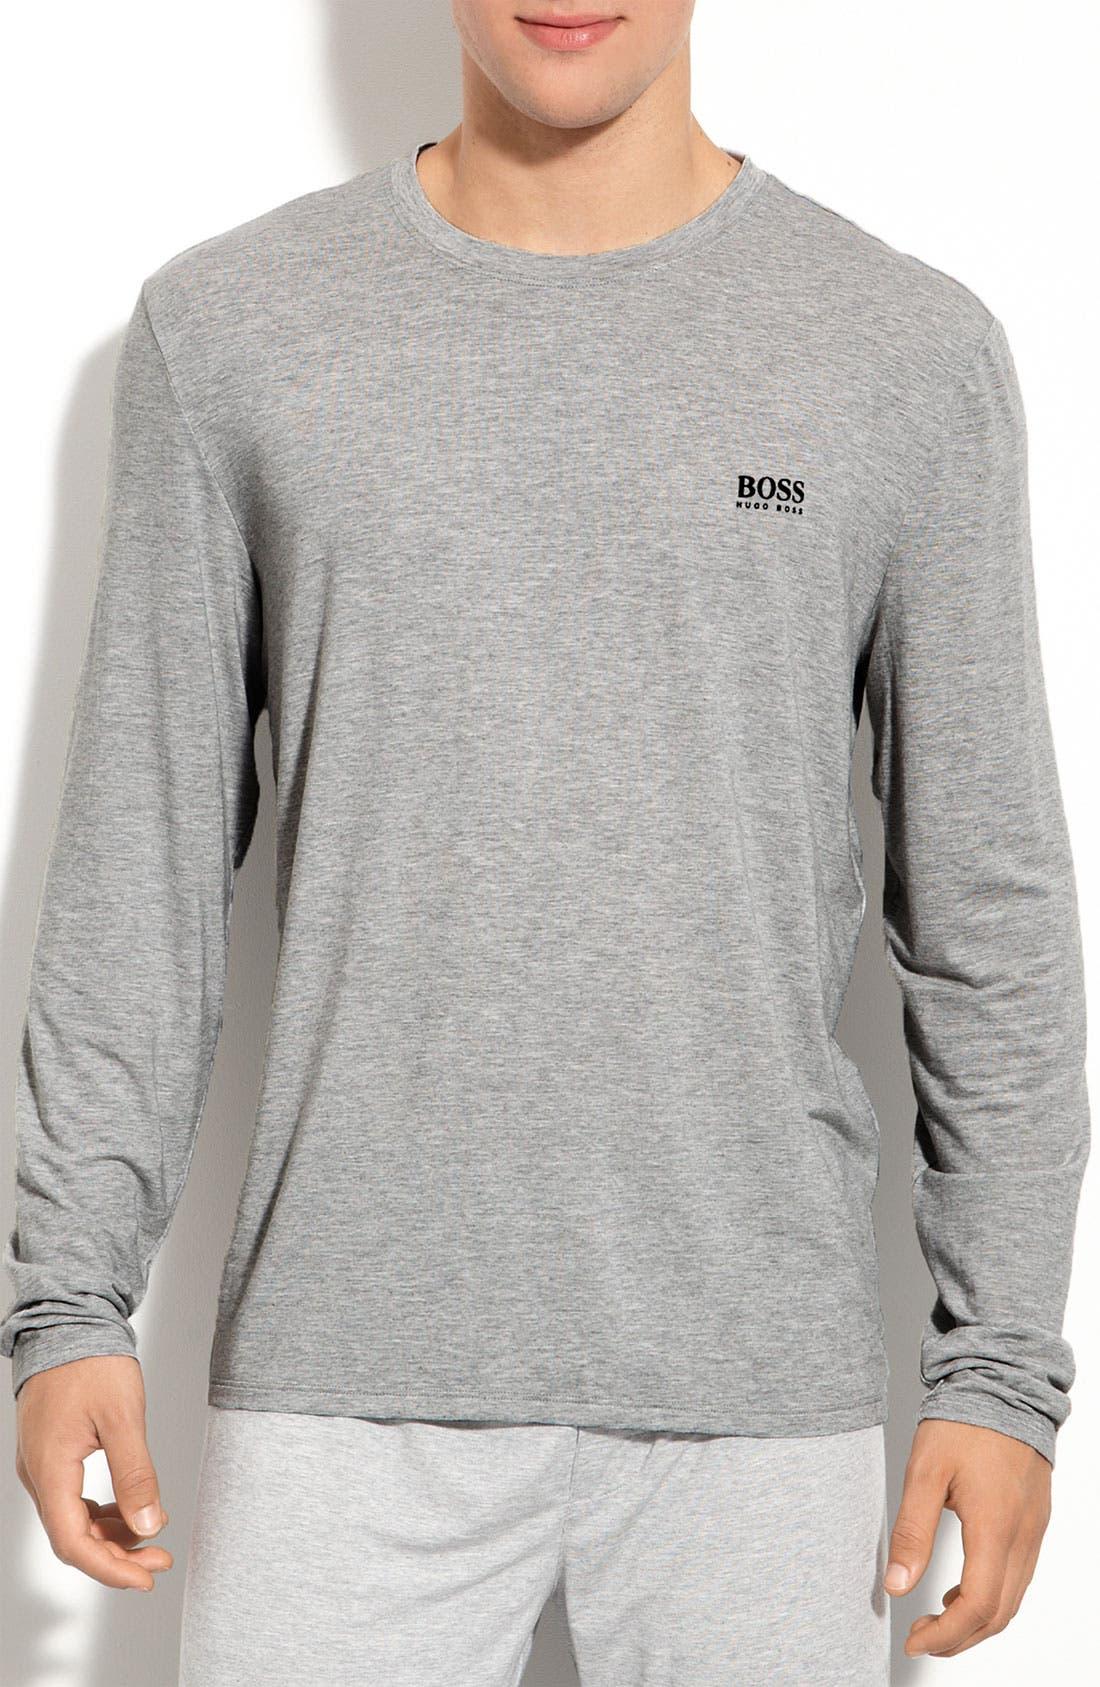 Alternate Image 1 Selected - BOSS 'Innovation 5' Lounge Shirt